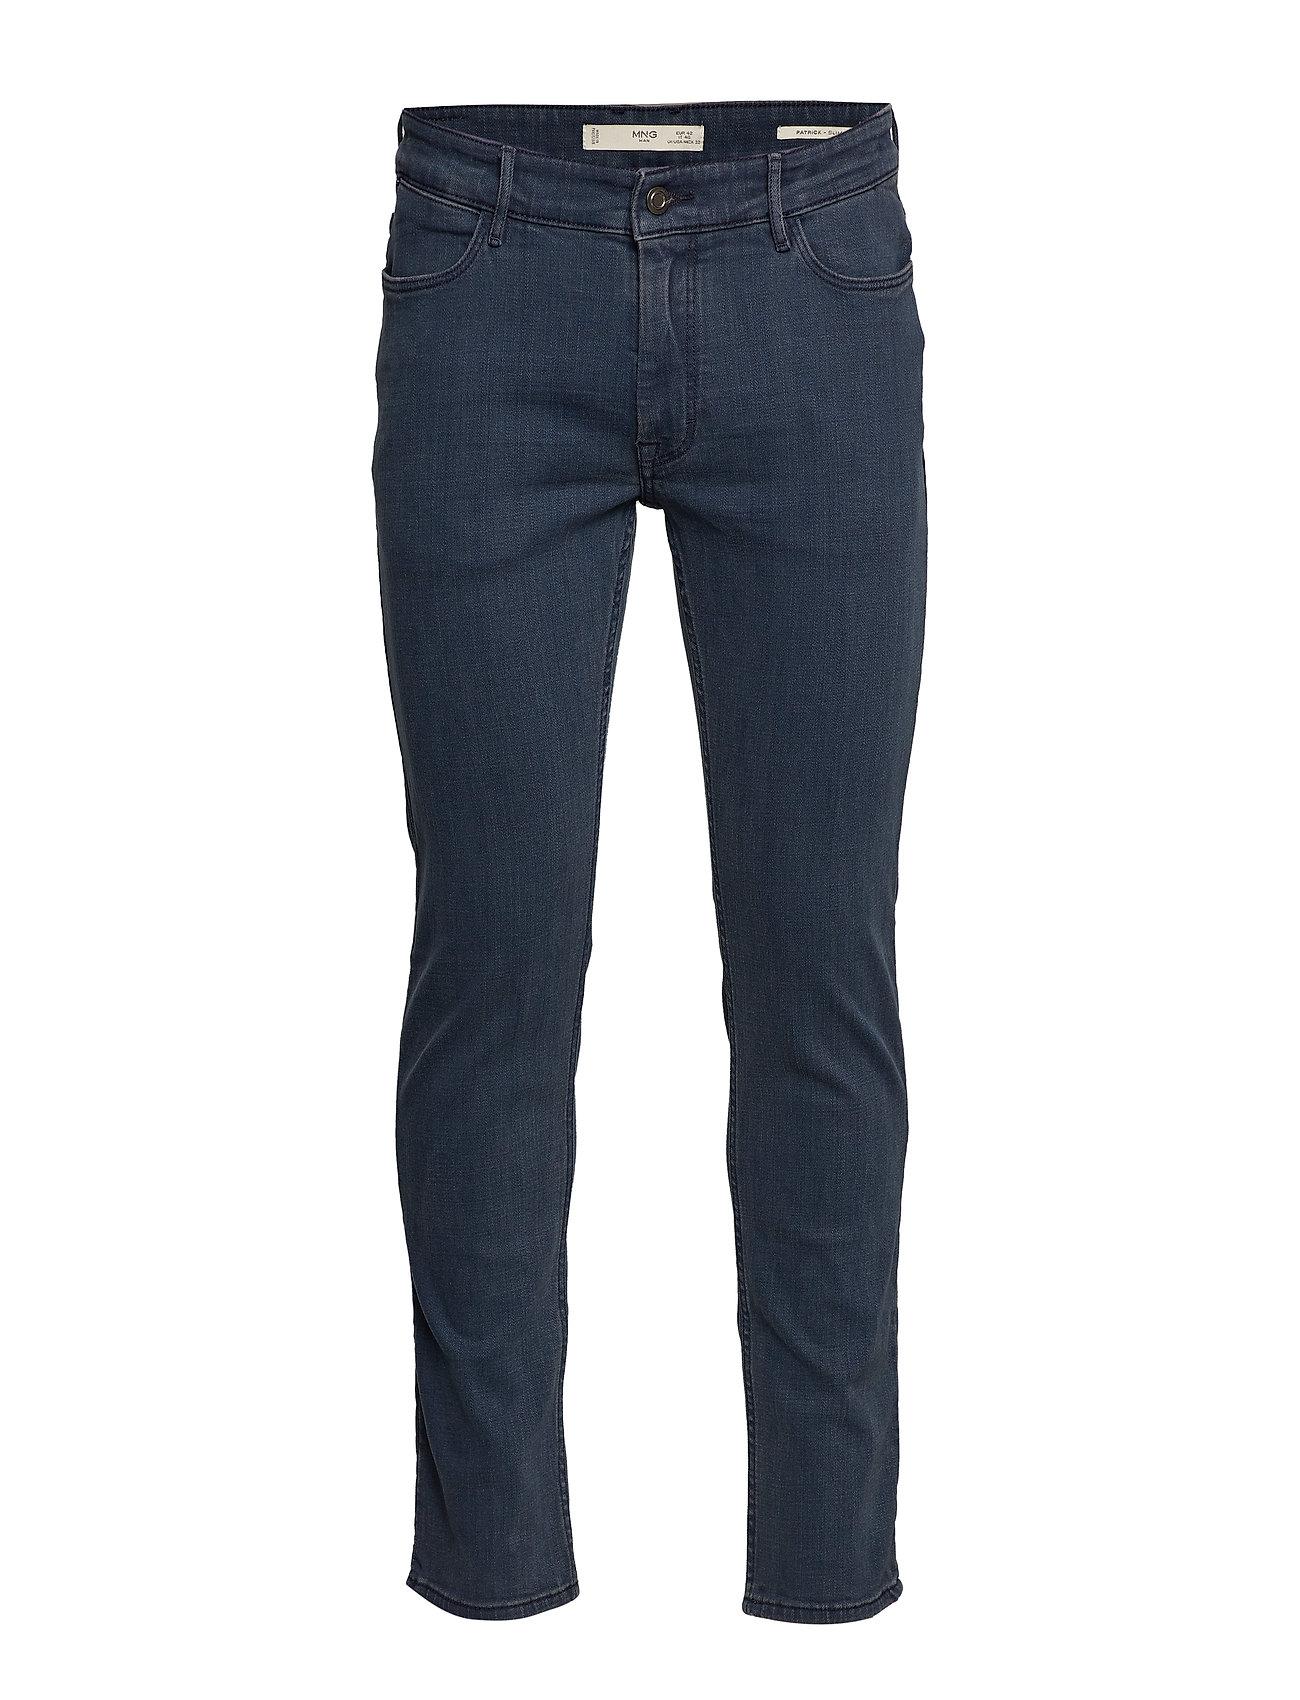 Mango Man Slim fit navy Patrick jeans - DARK BLUE